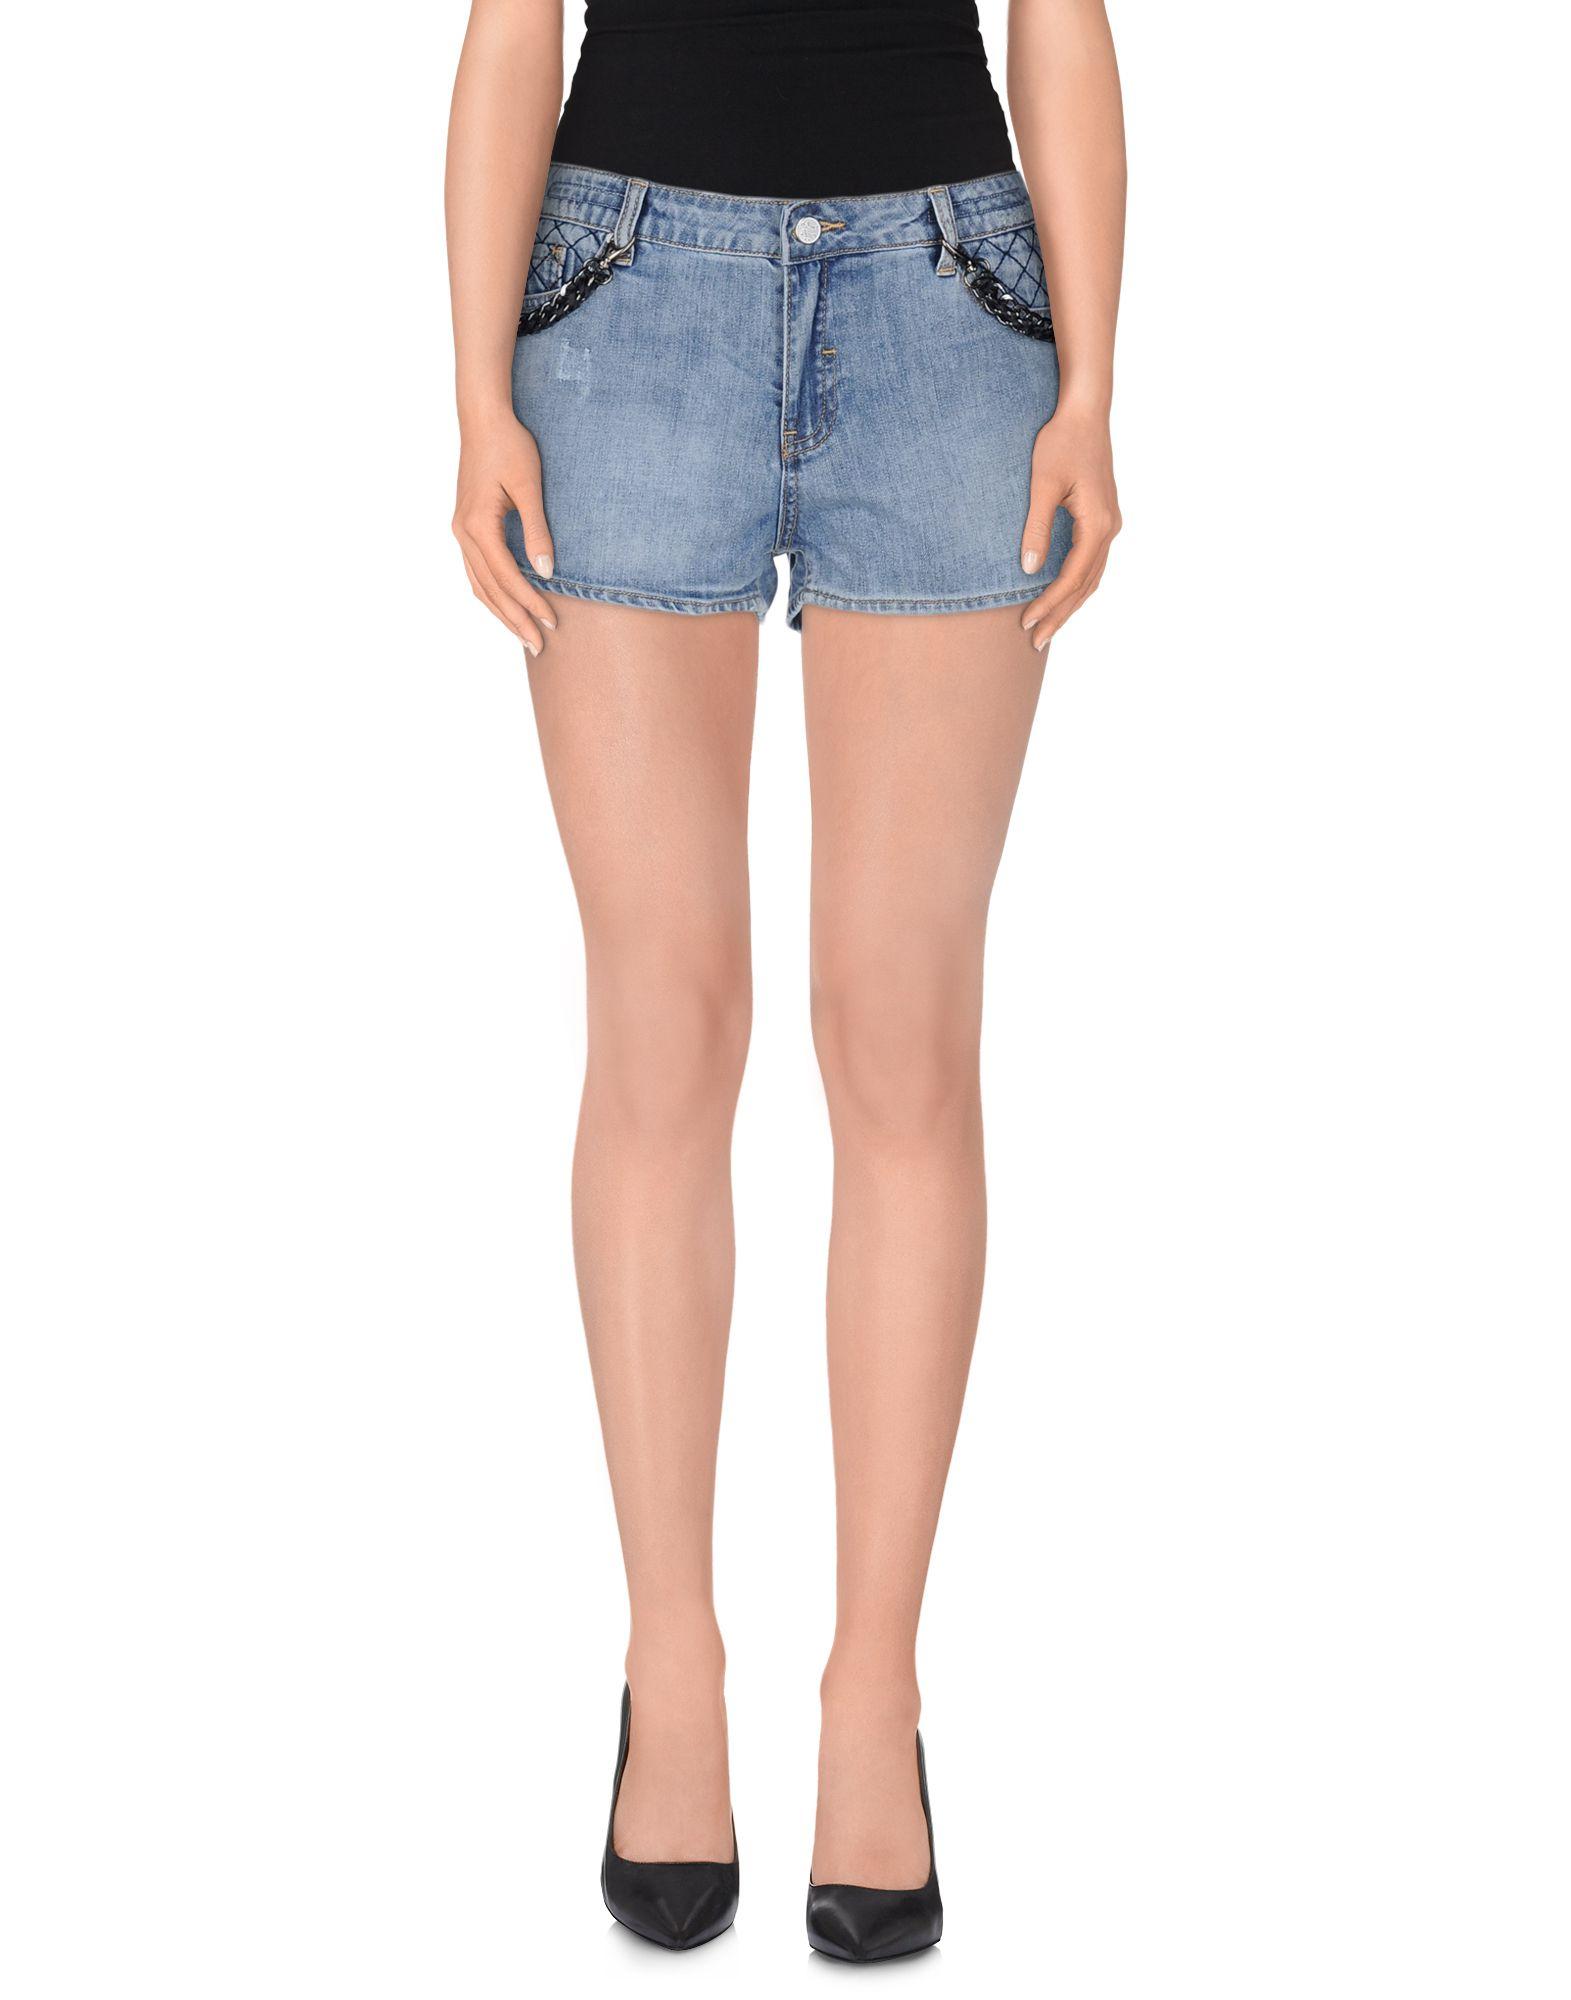 SILVIAN HEACH Джинсовые шорты шорты джинсовые 3 12 лет